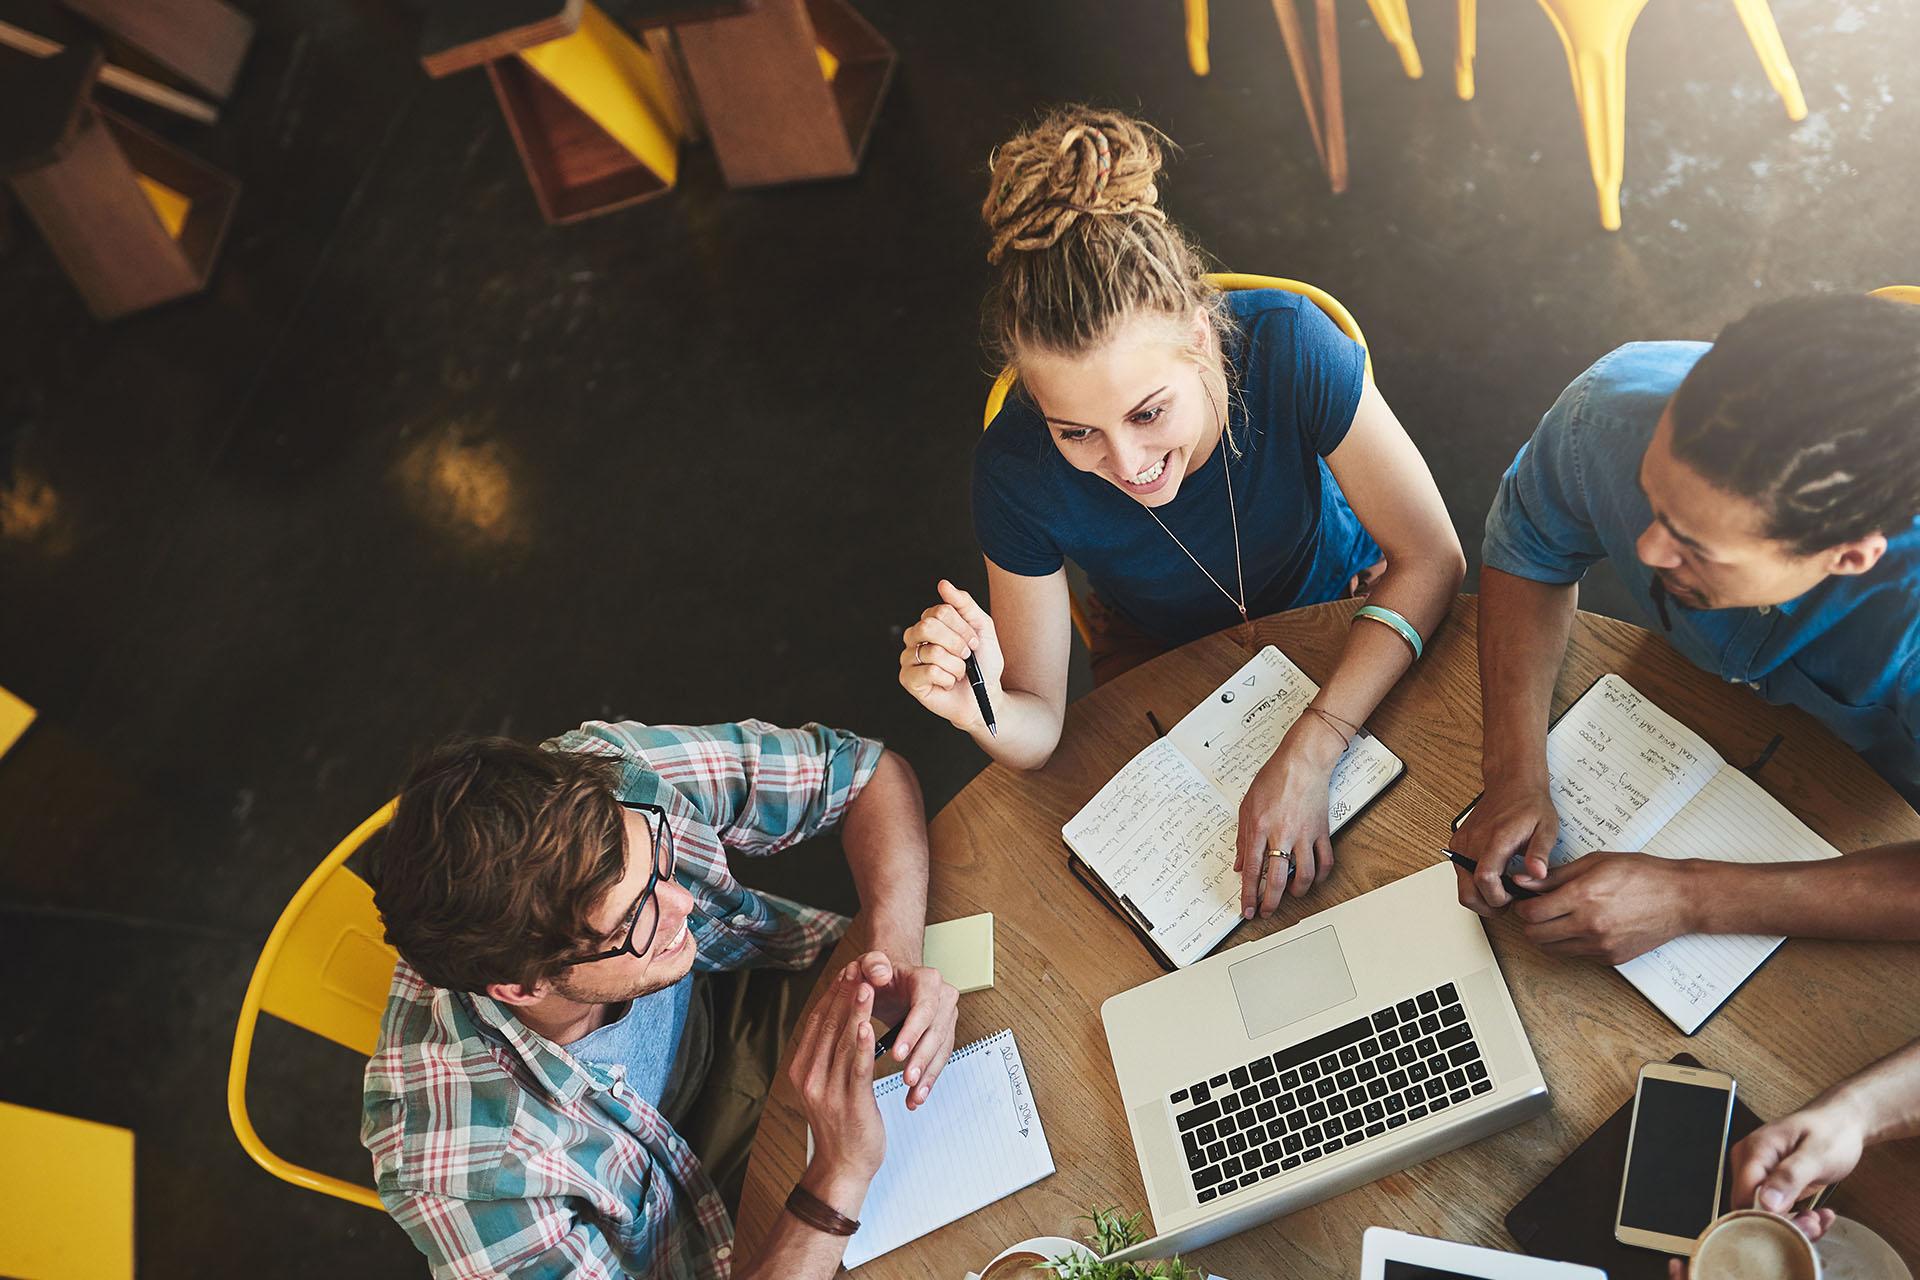 20% on the job training FAQs